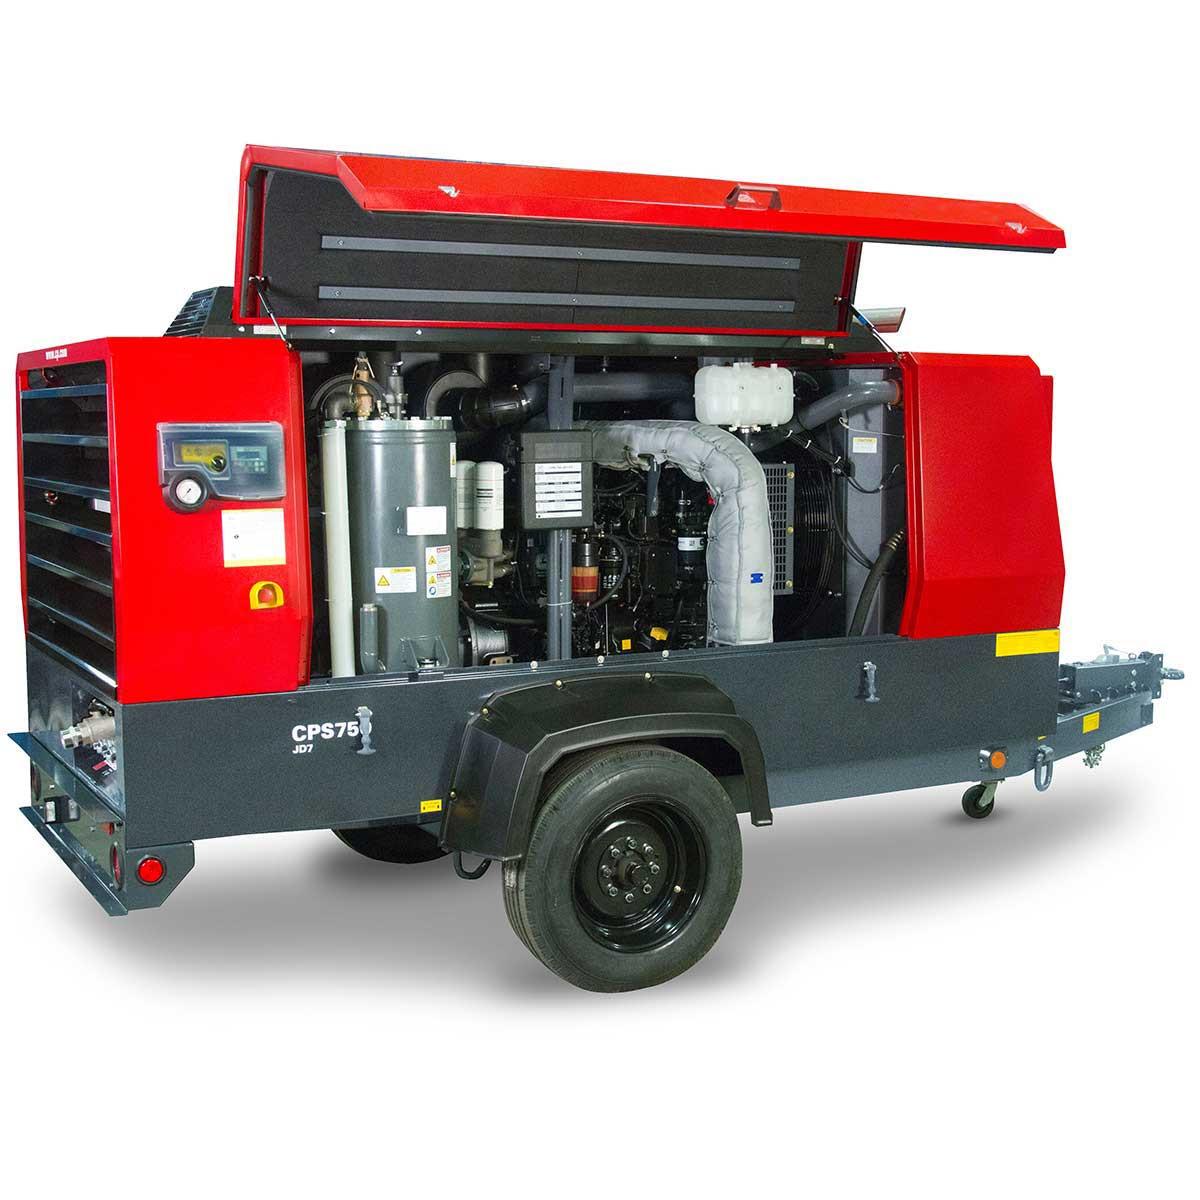 CPS750JD7iT4 Portable Diesel Compressor